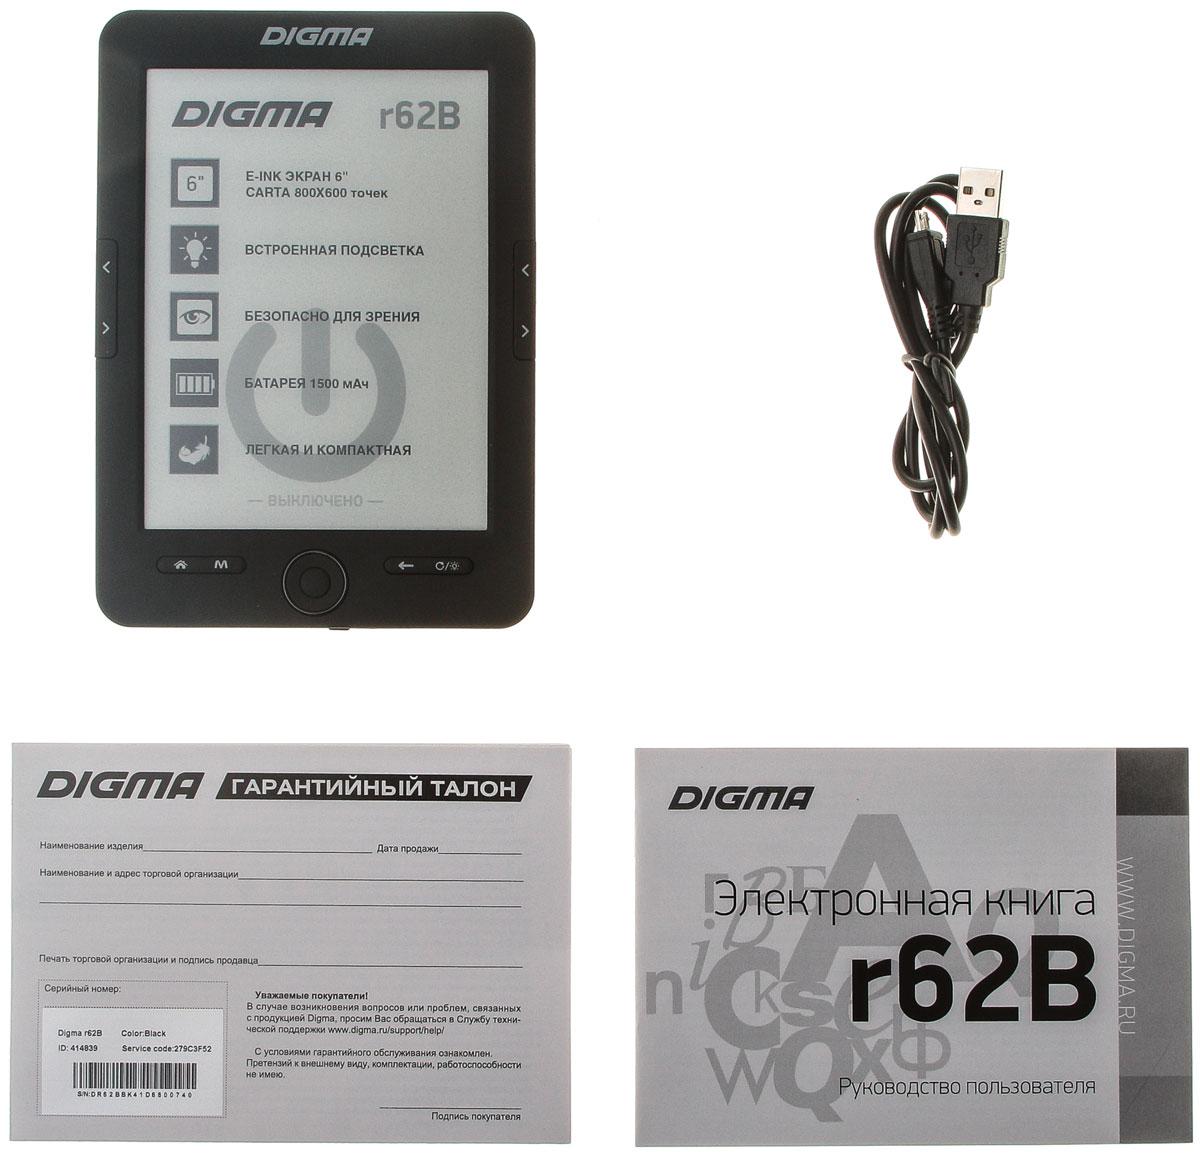 Digma R62B, Blackэлектронная книга Digma